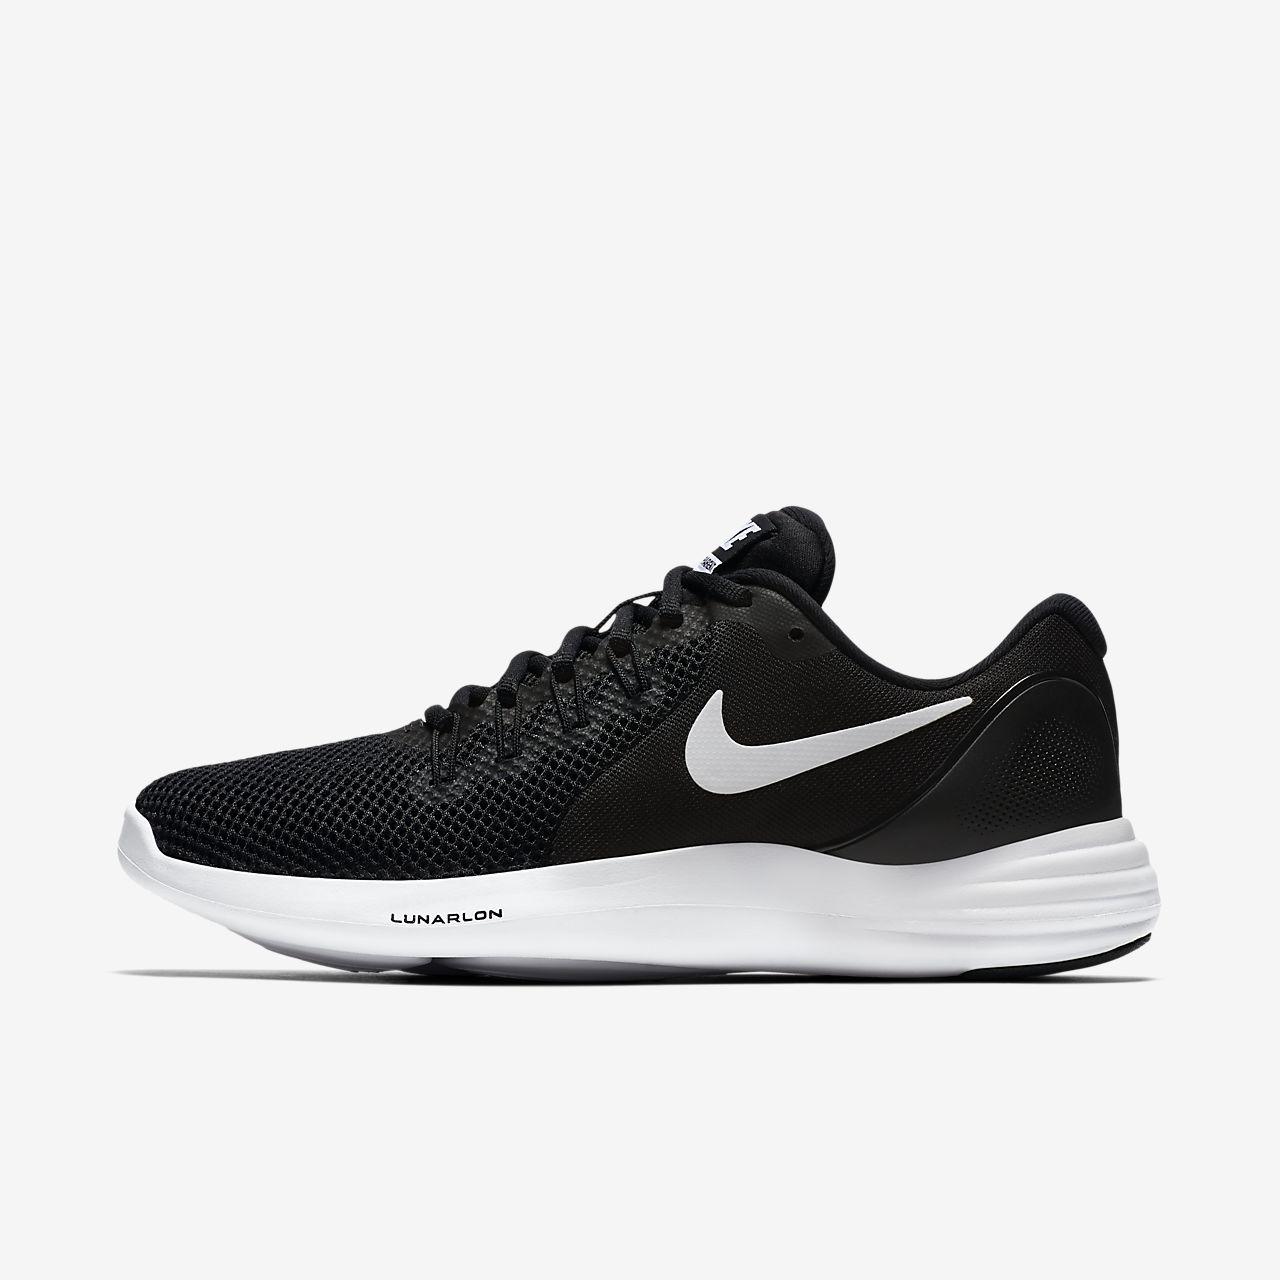 Nike Lunar for Women